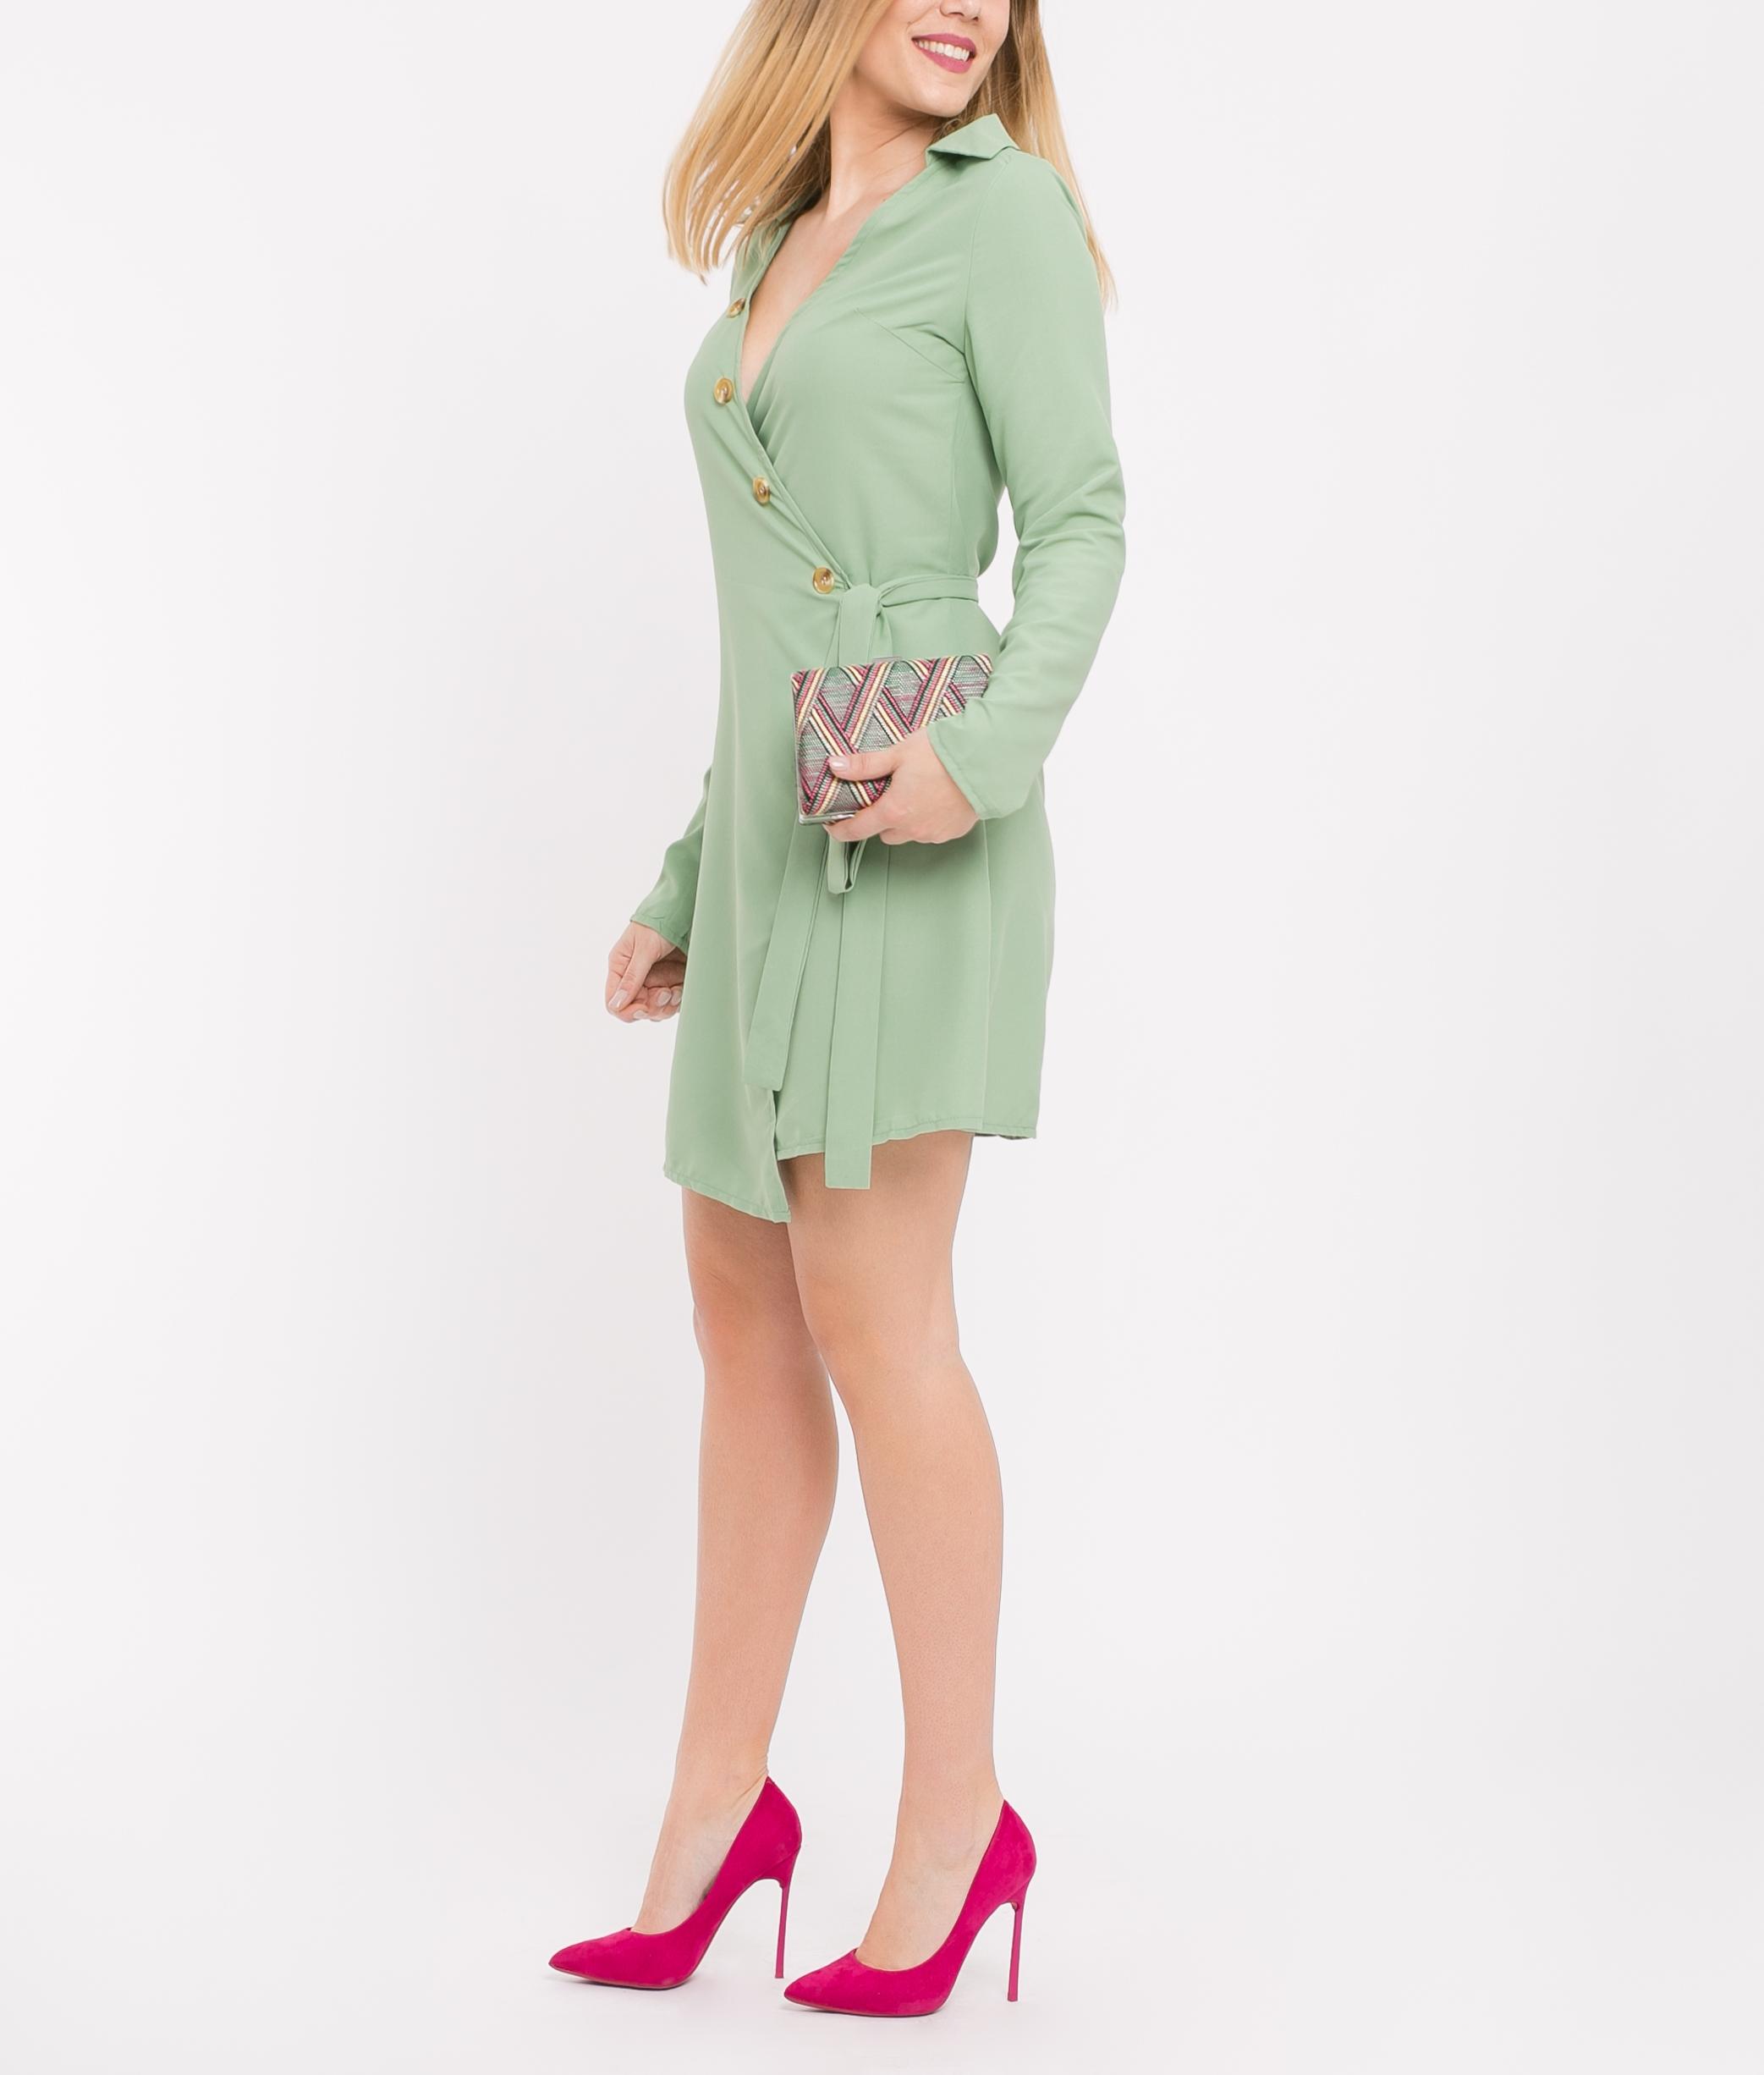 Vestido Firdos - Beige